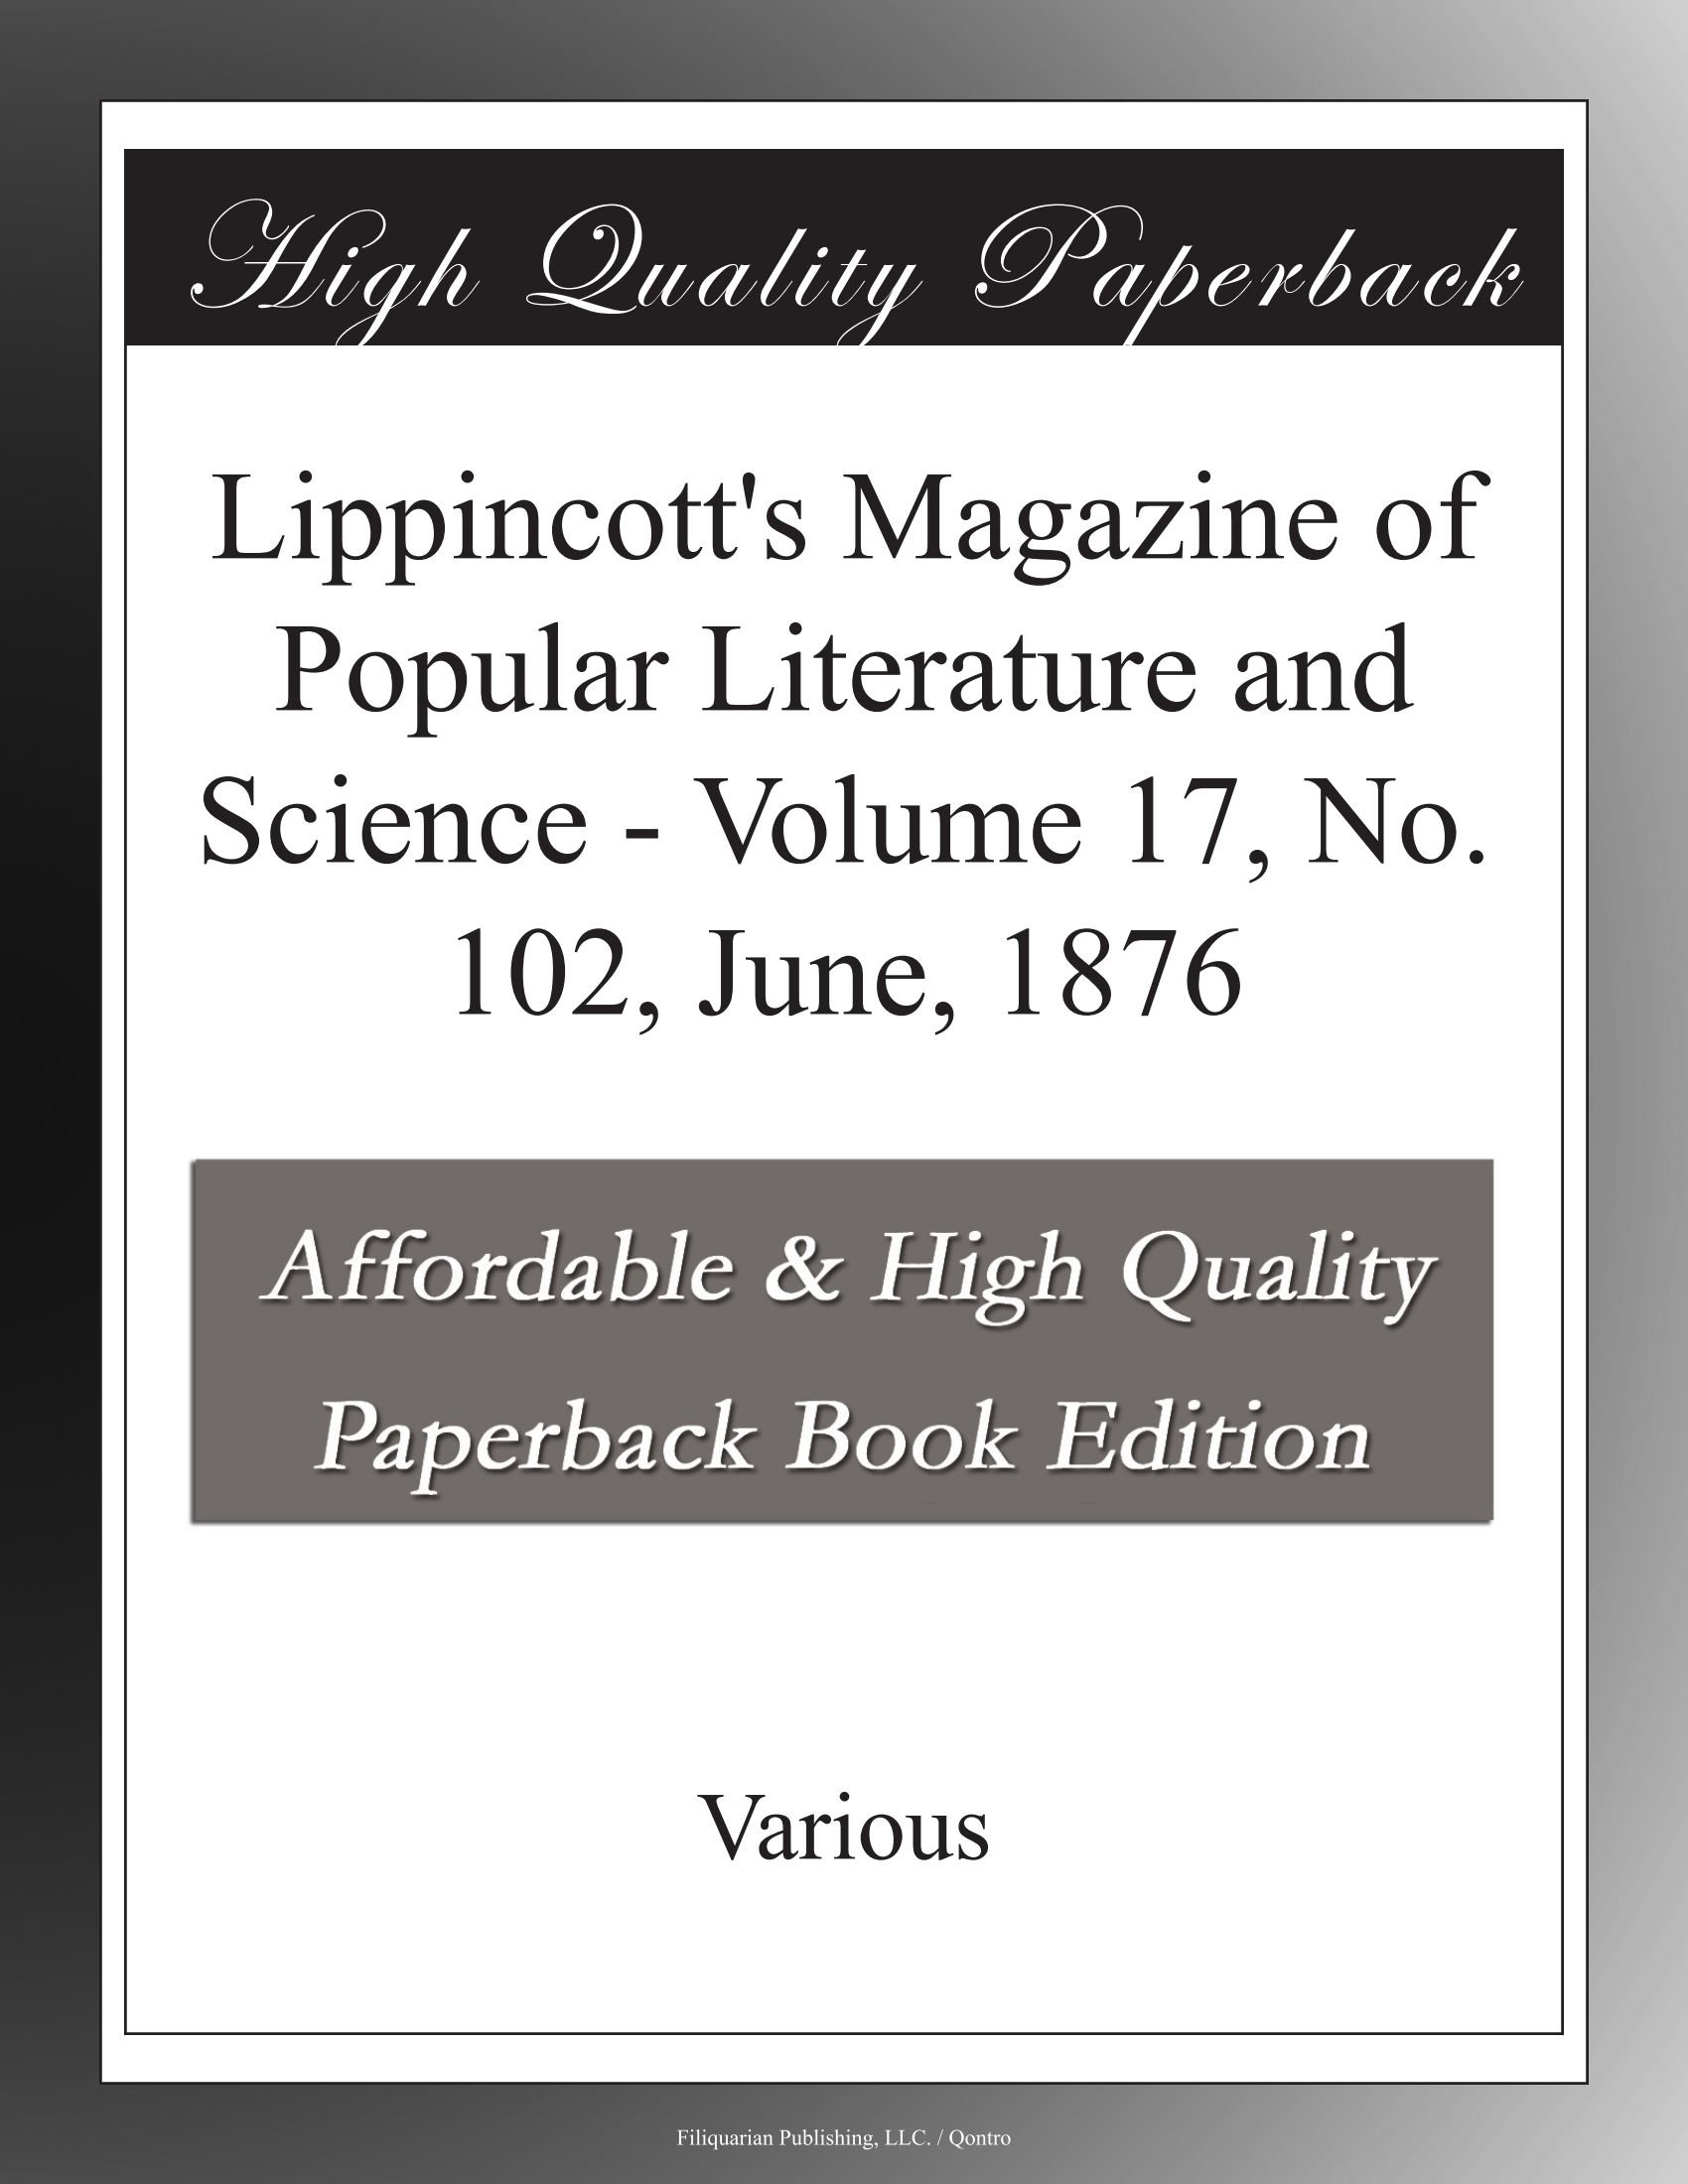 Lippincott's Magazine of Popular Literature and Science - Volume 17, No. 102, June, 1876 ebook